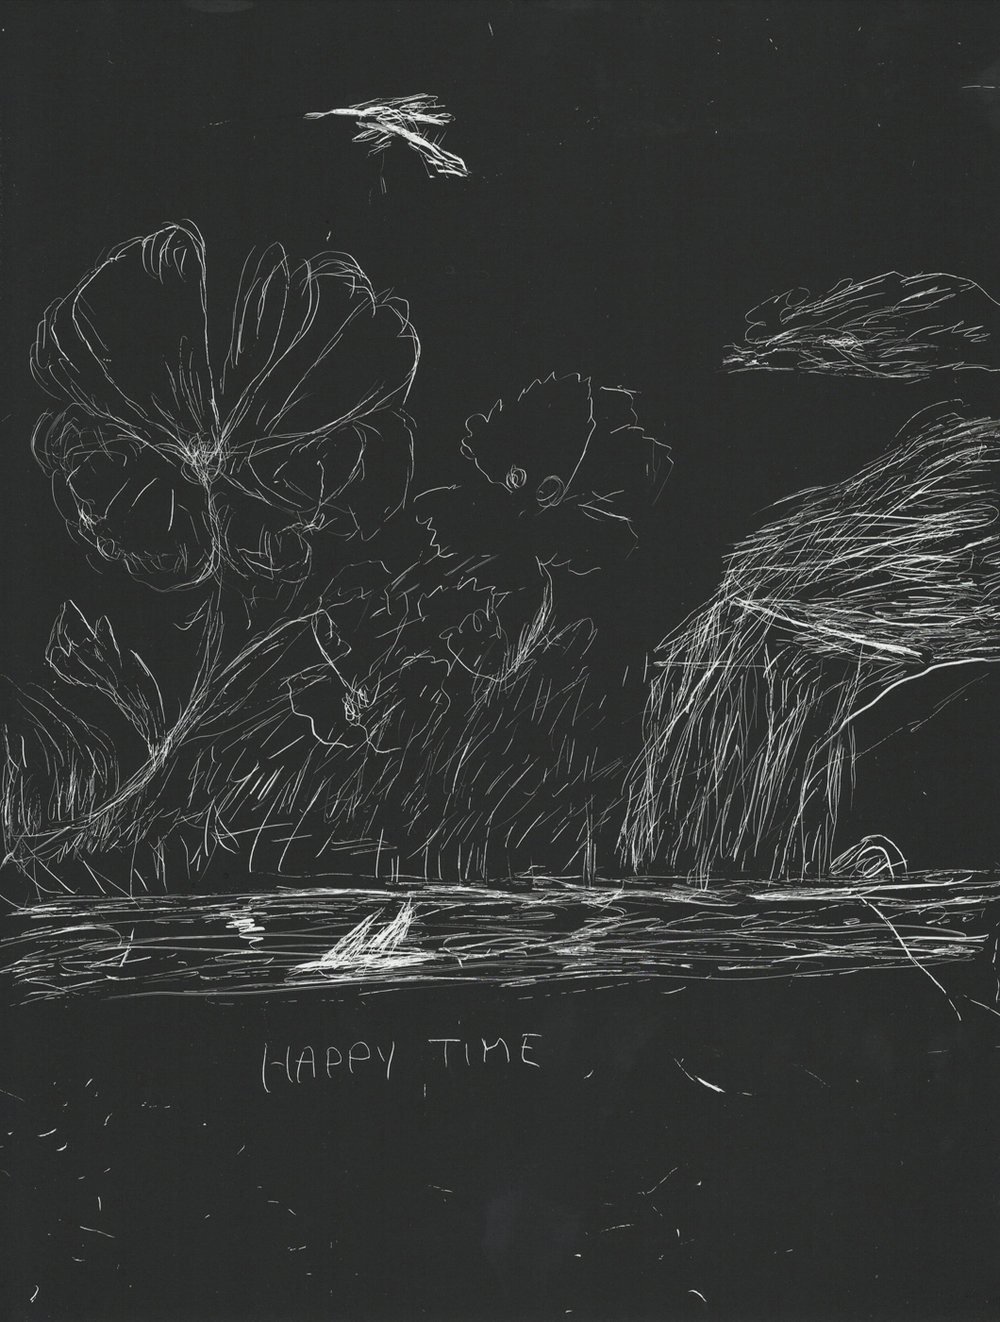 2 of 2 Happytime, Hurricane.jpg